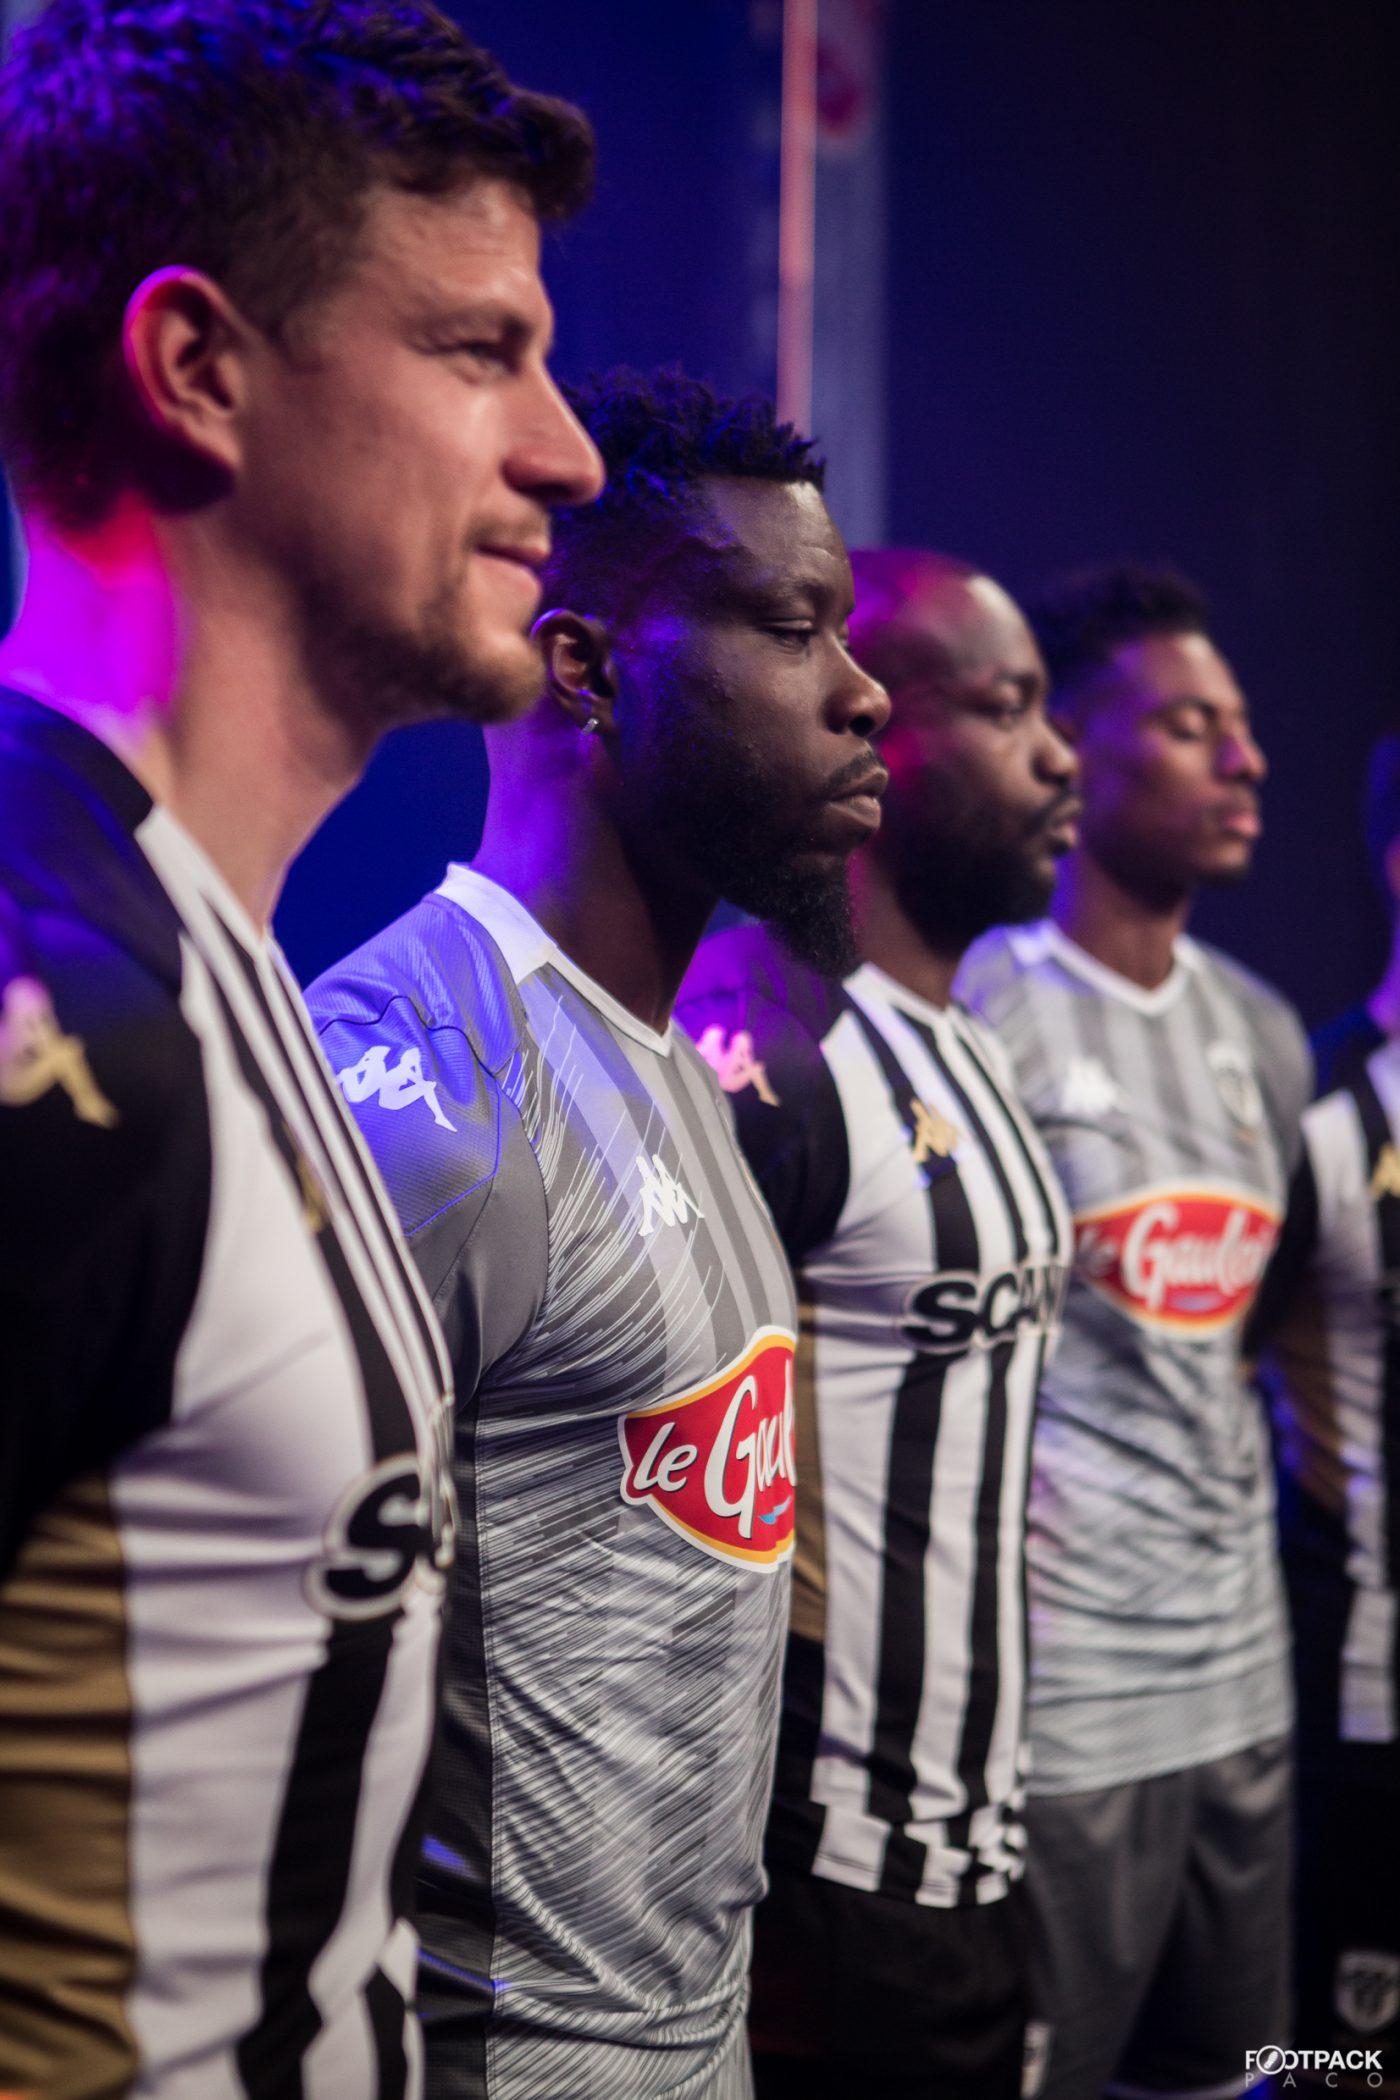 maillot-angers-sco-2019-2020-kappa-2